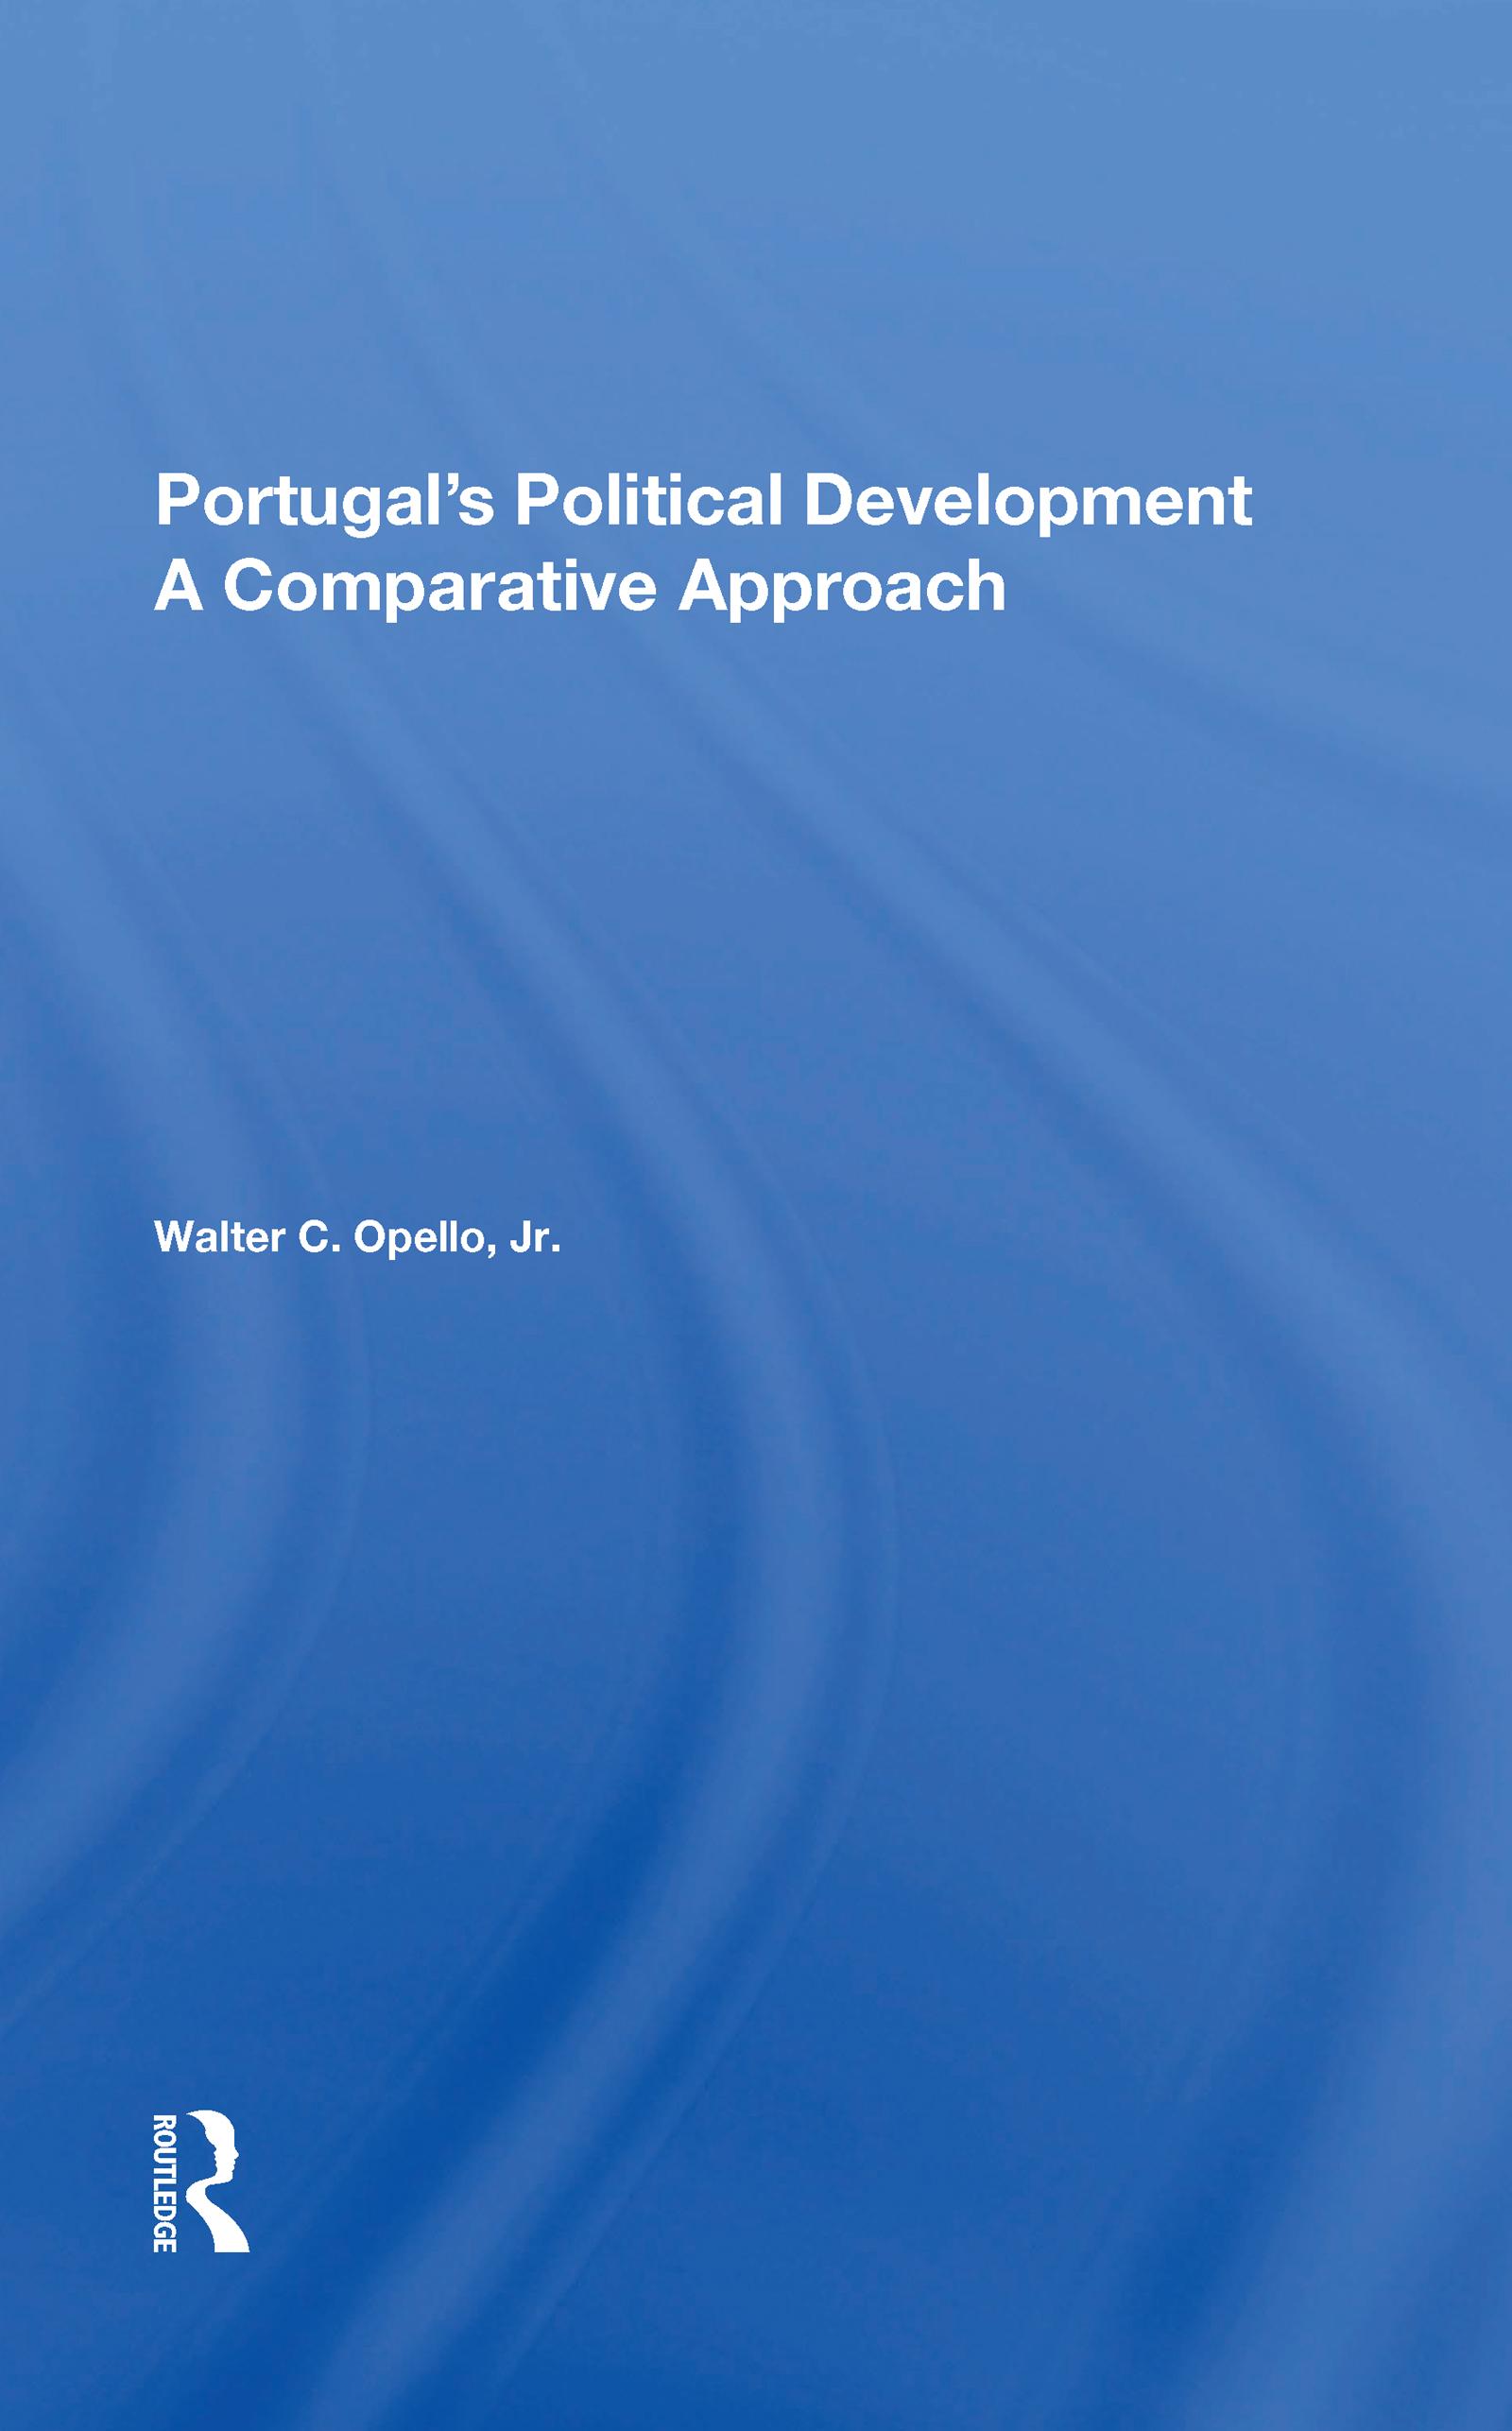 Portugal's Political Development